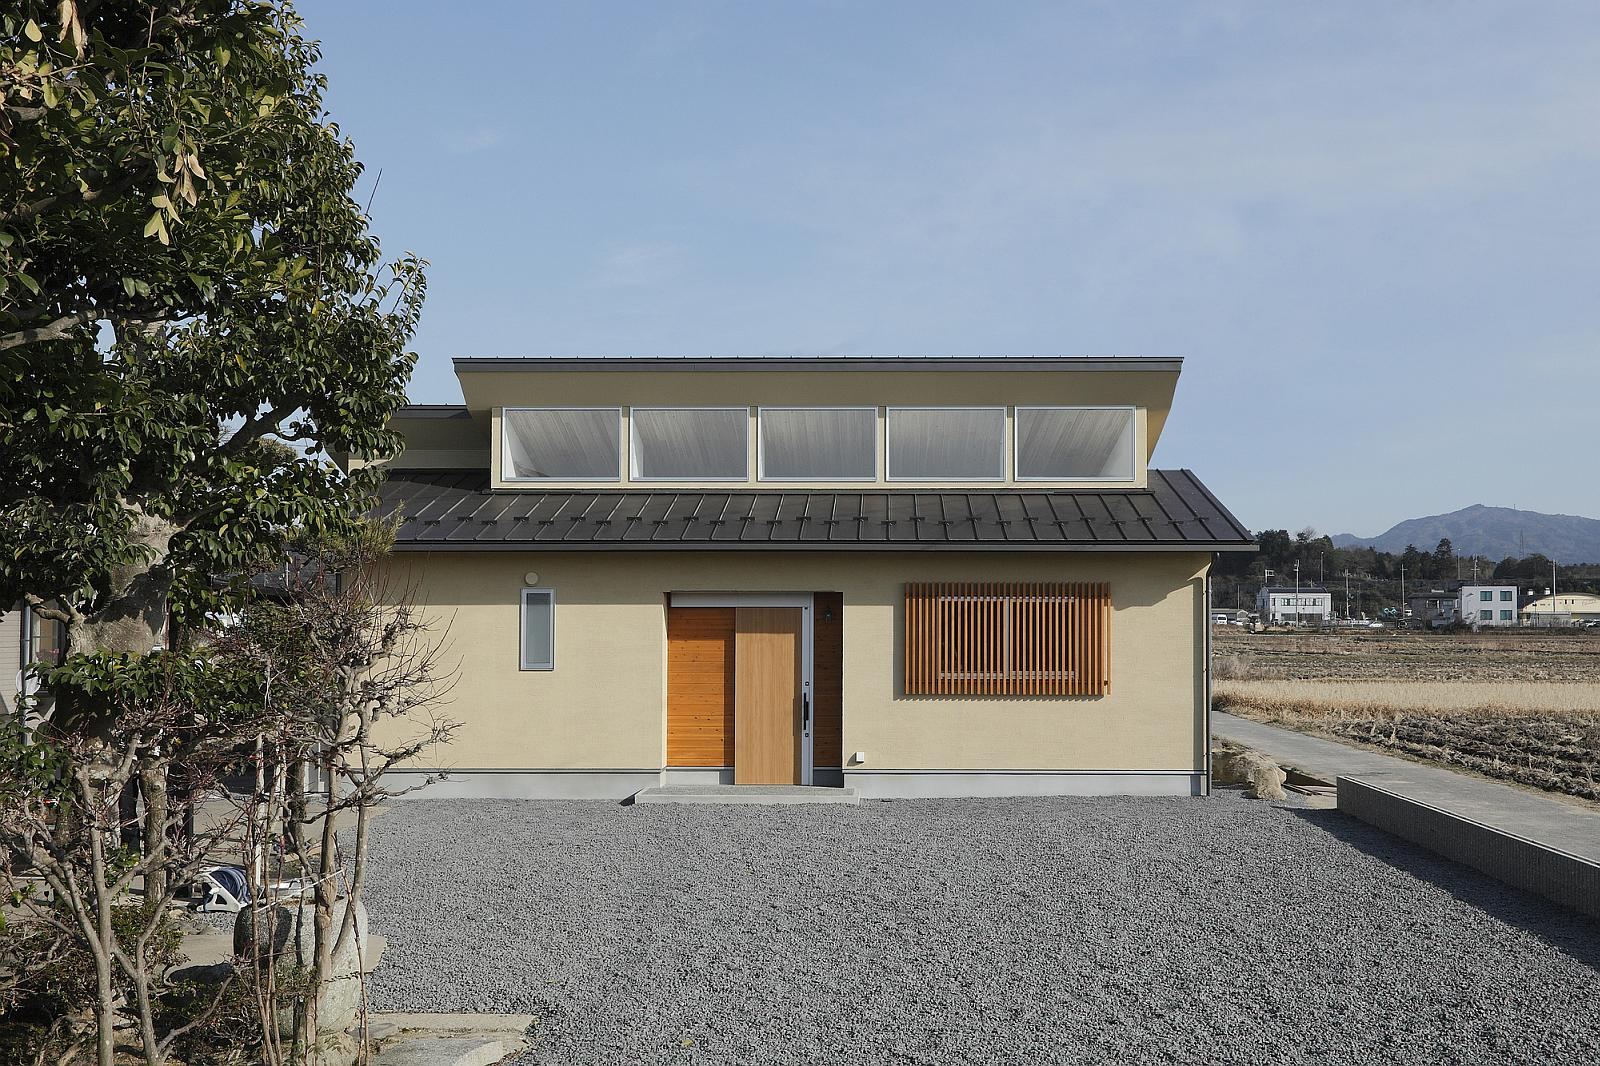 A Modest Light Filled Home In Rural Japan | ALTS Design Office